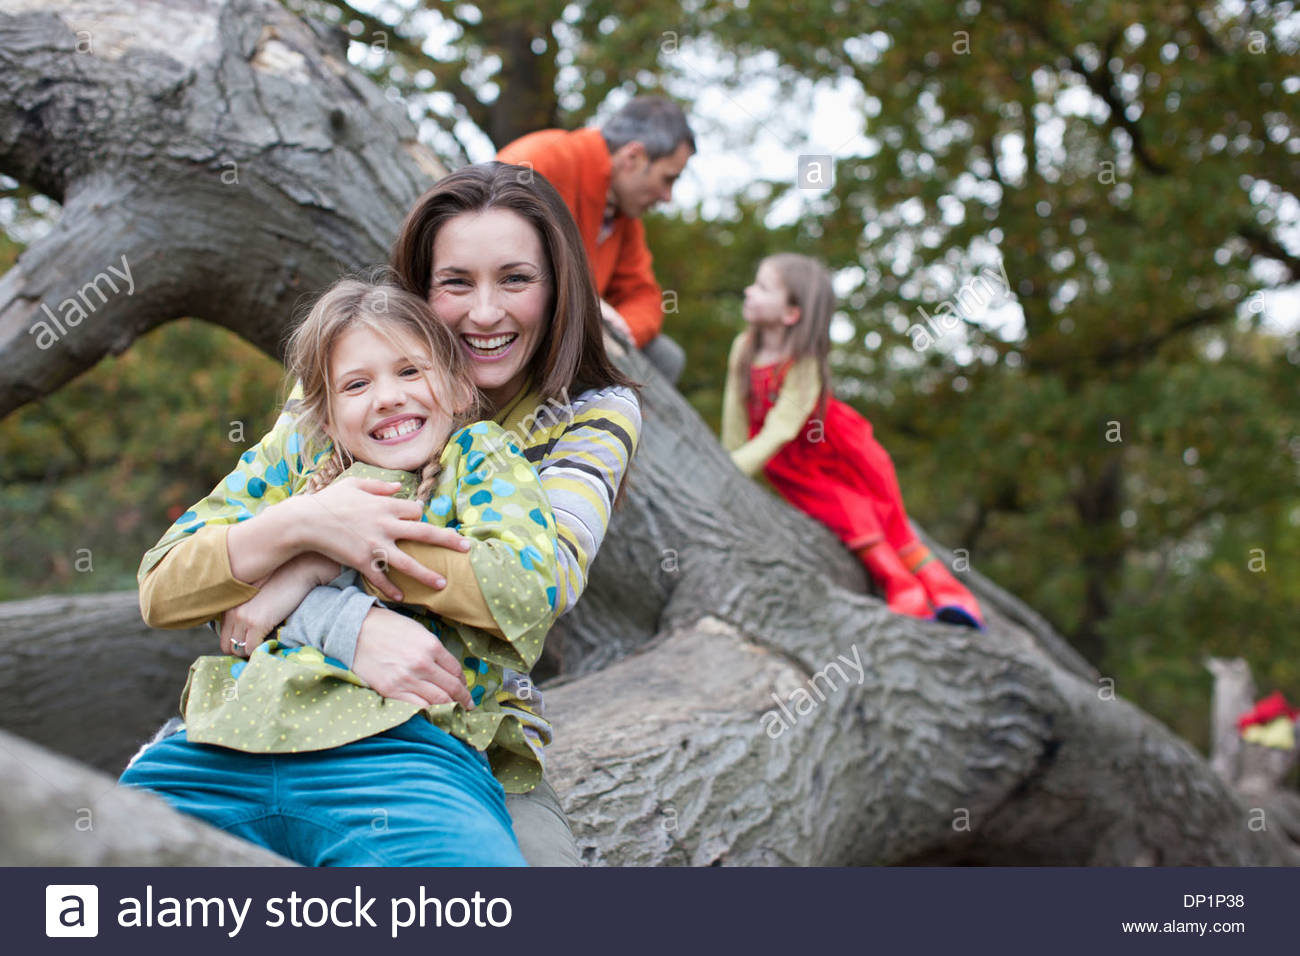 Family climbing on tree branch - Stock Image